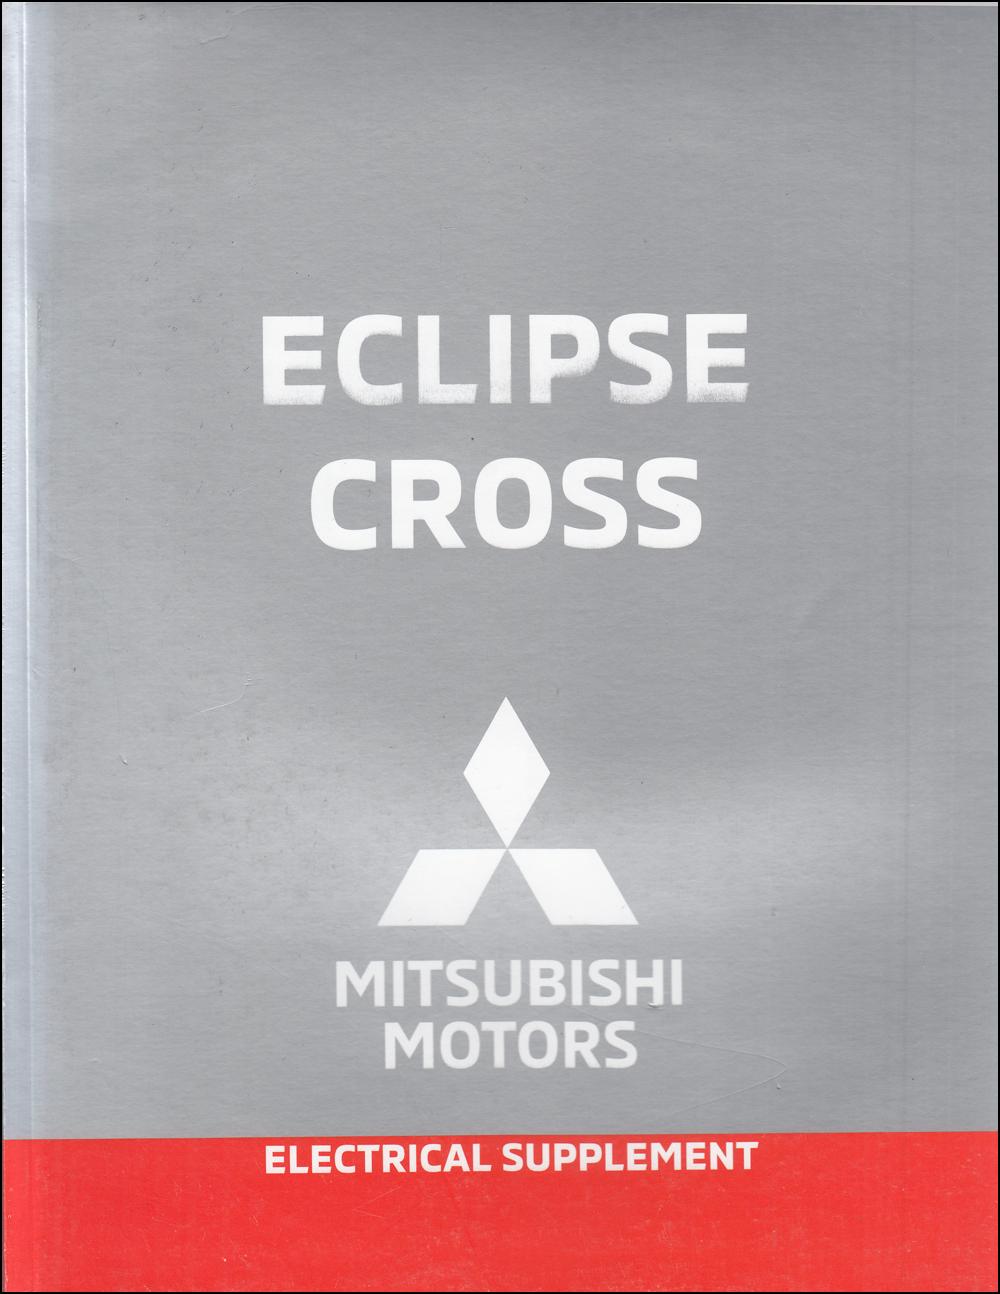 2019 Mitsubishi Eclipse Cross Wiring Diagram Manual Original